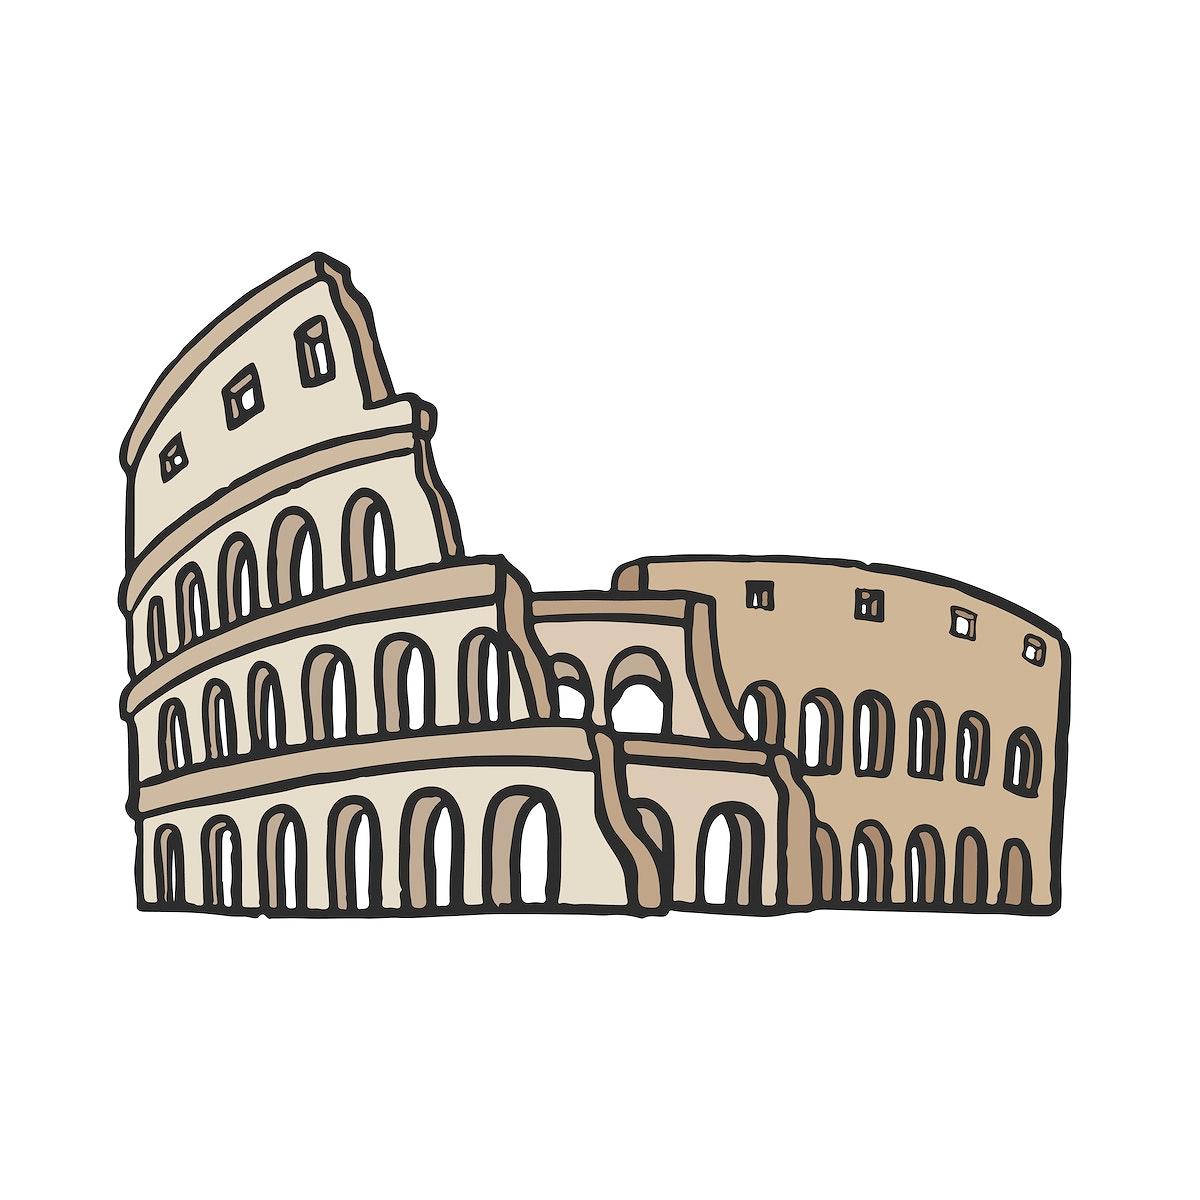 Ancient Roman Colosseum graphic illustration